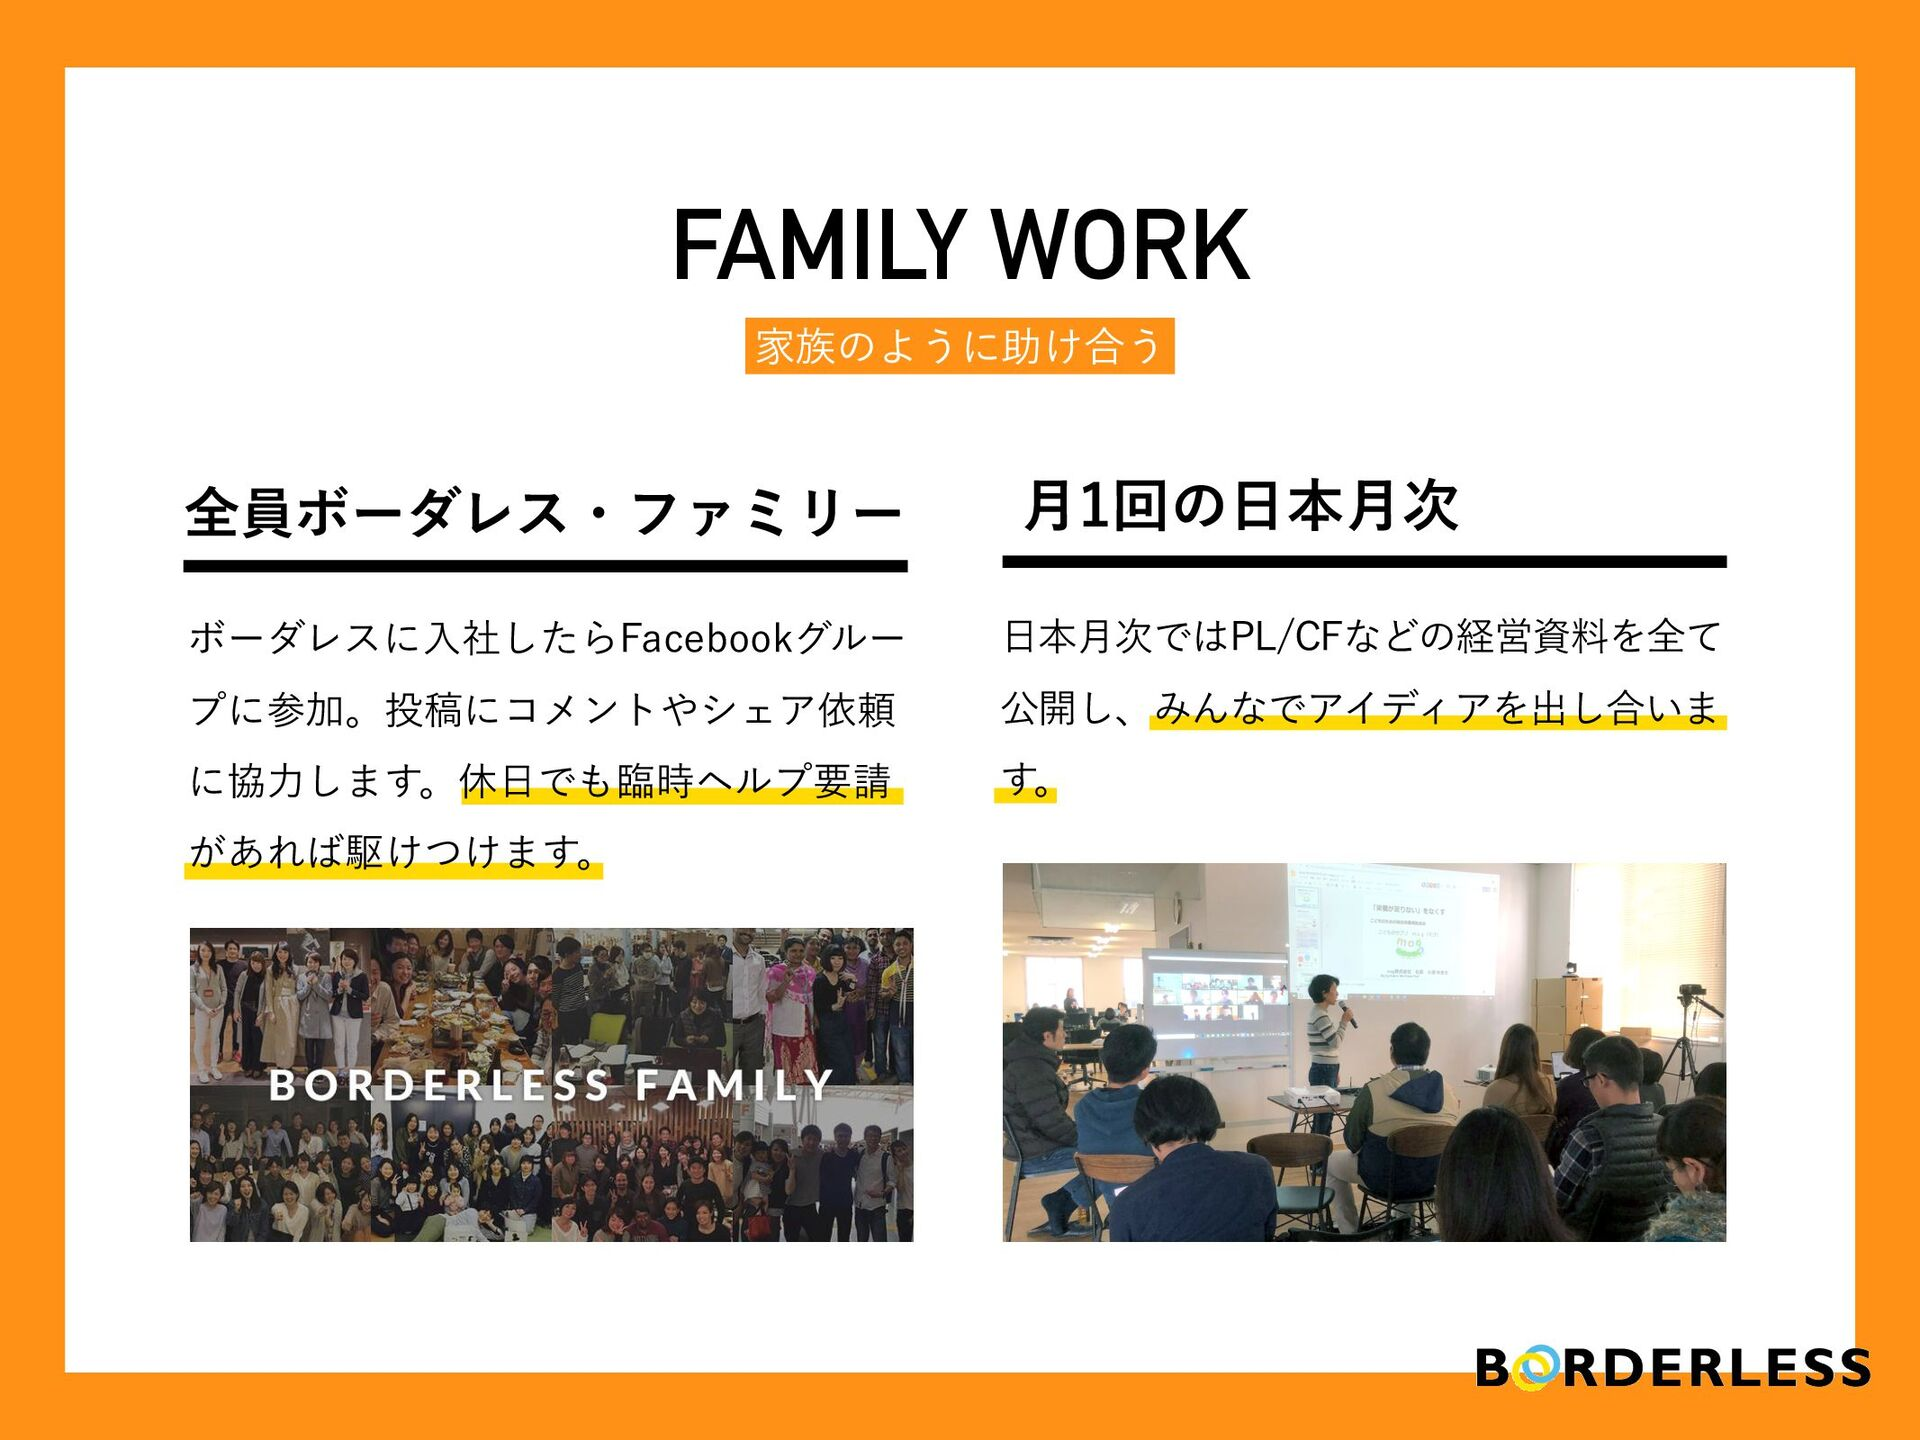 N FAMILY WORK ՈͷΑ͏ʹॿ͚߹͏ ϘʔμϨεʹೖࣾͨ͠Β'BDFCPPLάϧʔ...